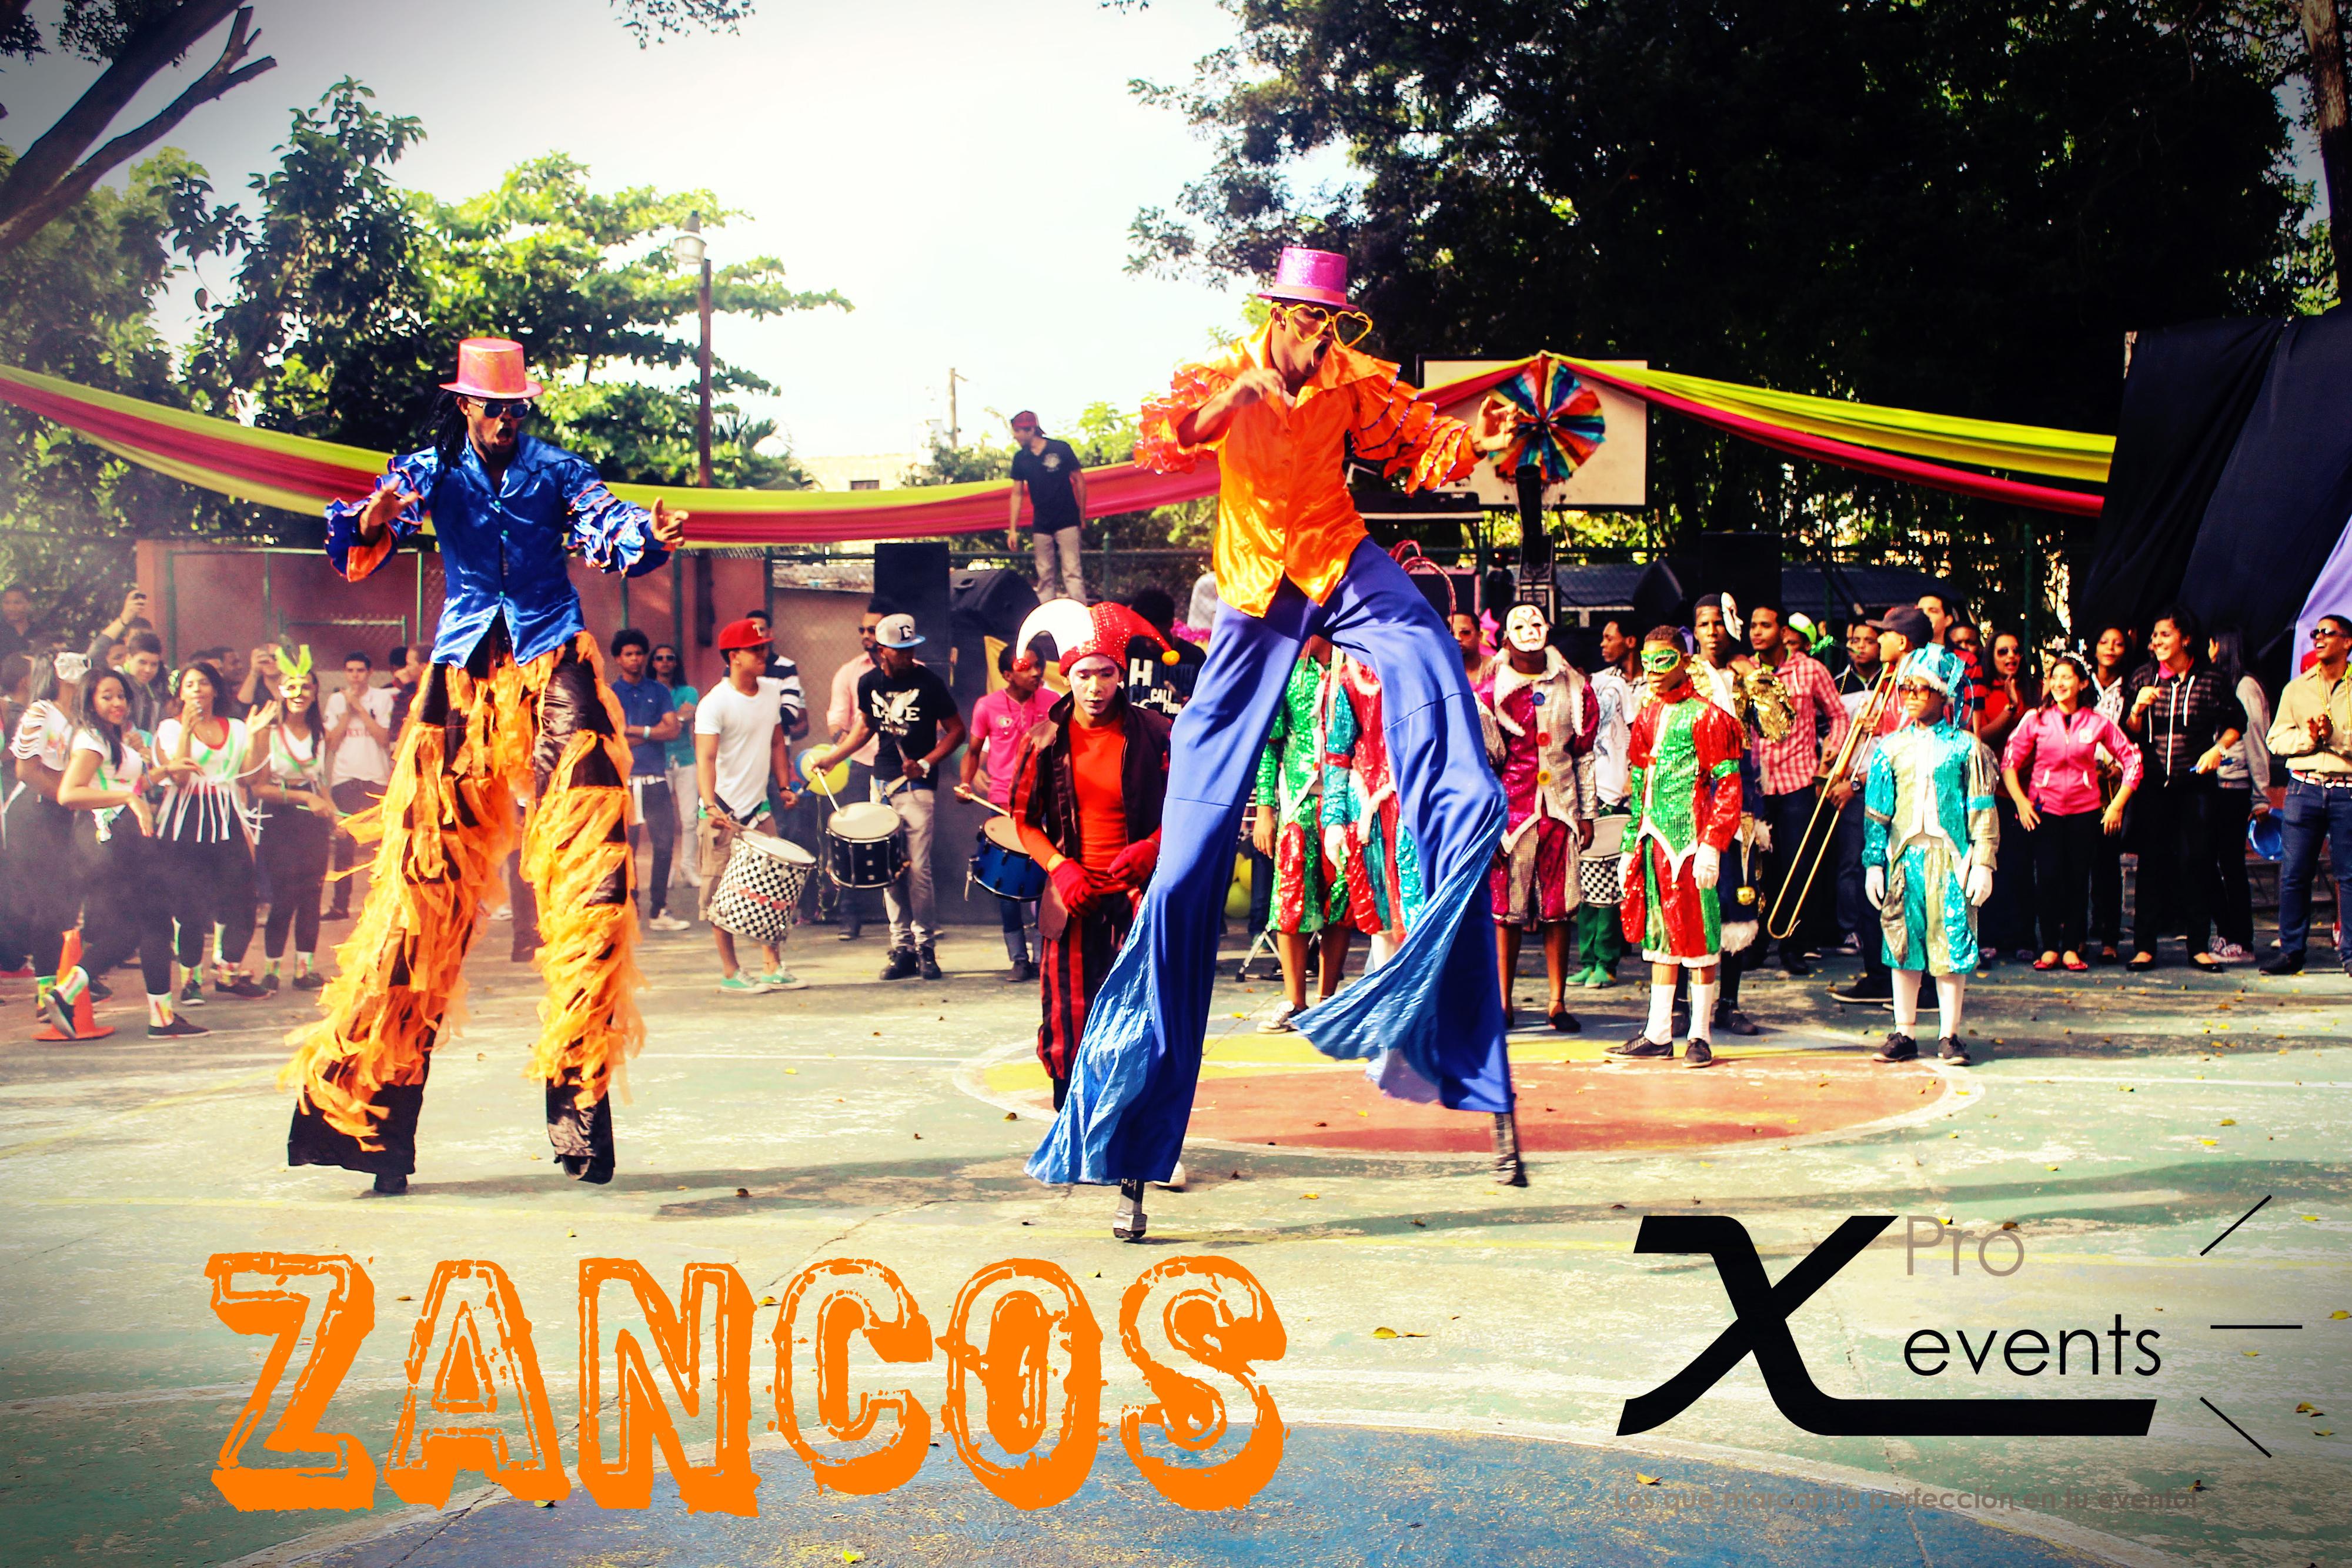 X Pro events  - 809-846-3784 - Zancos.jpg